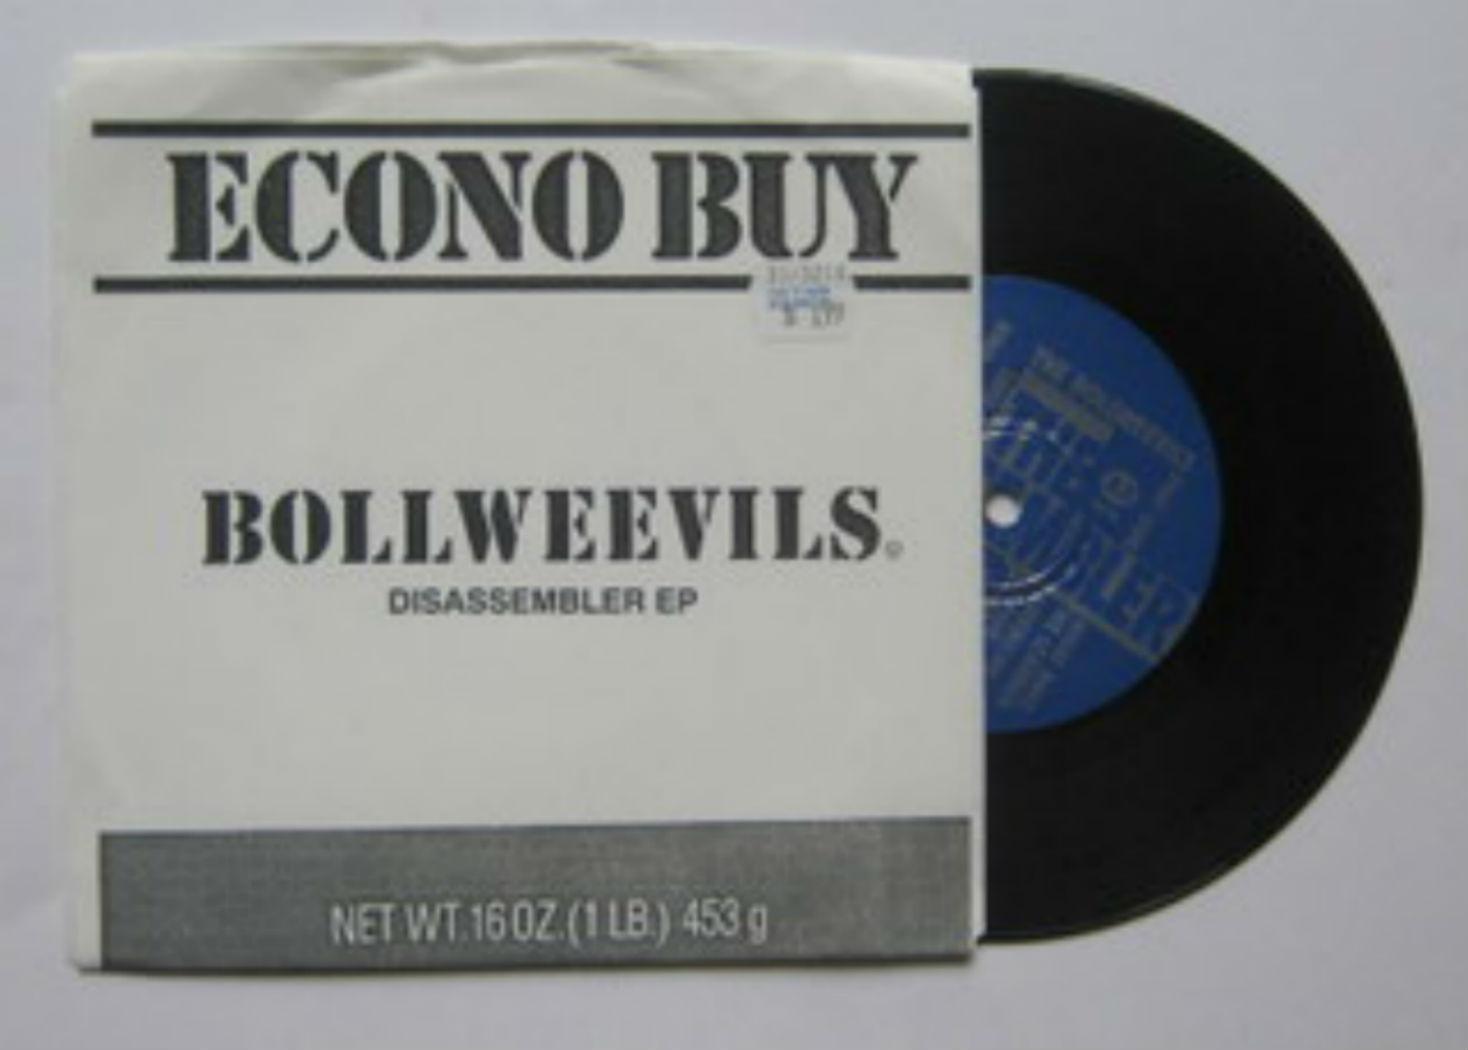 Bollweevils / Dissembler EP